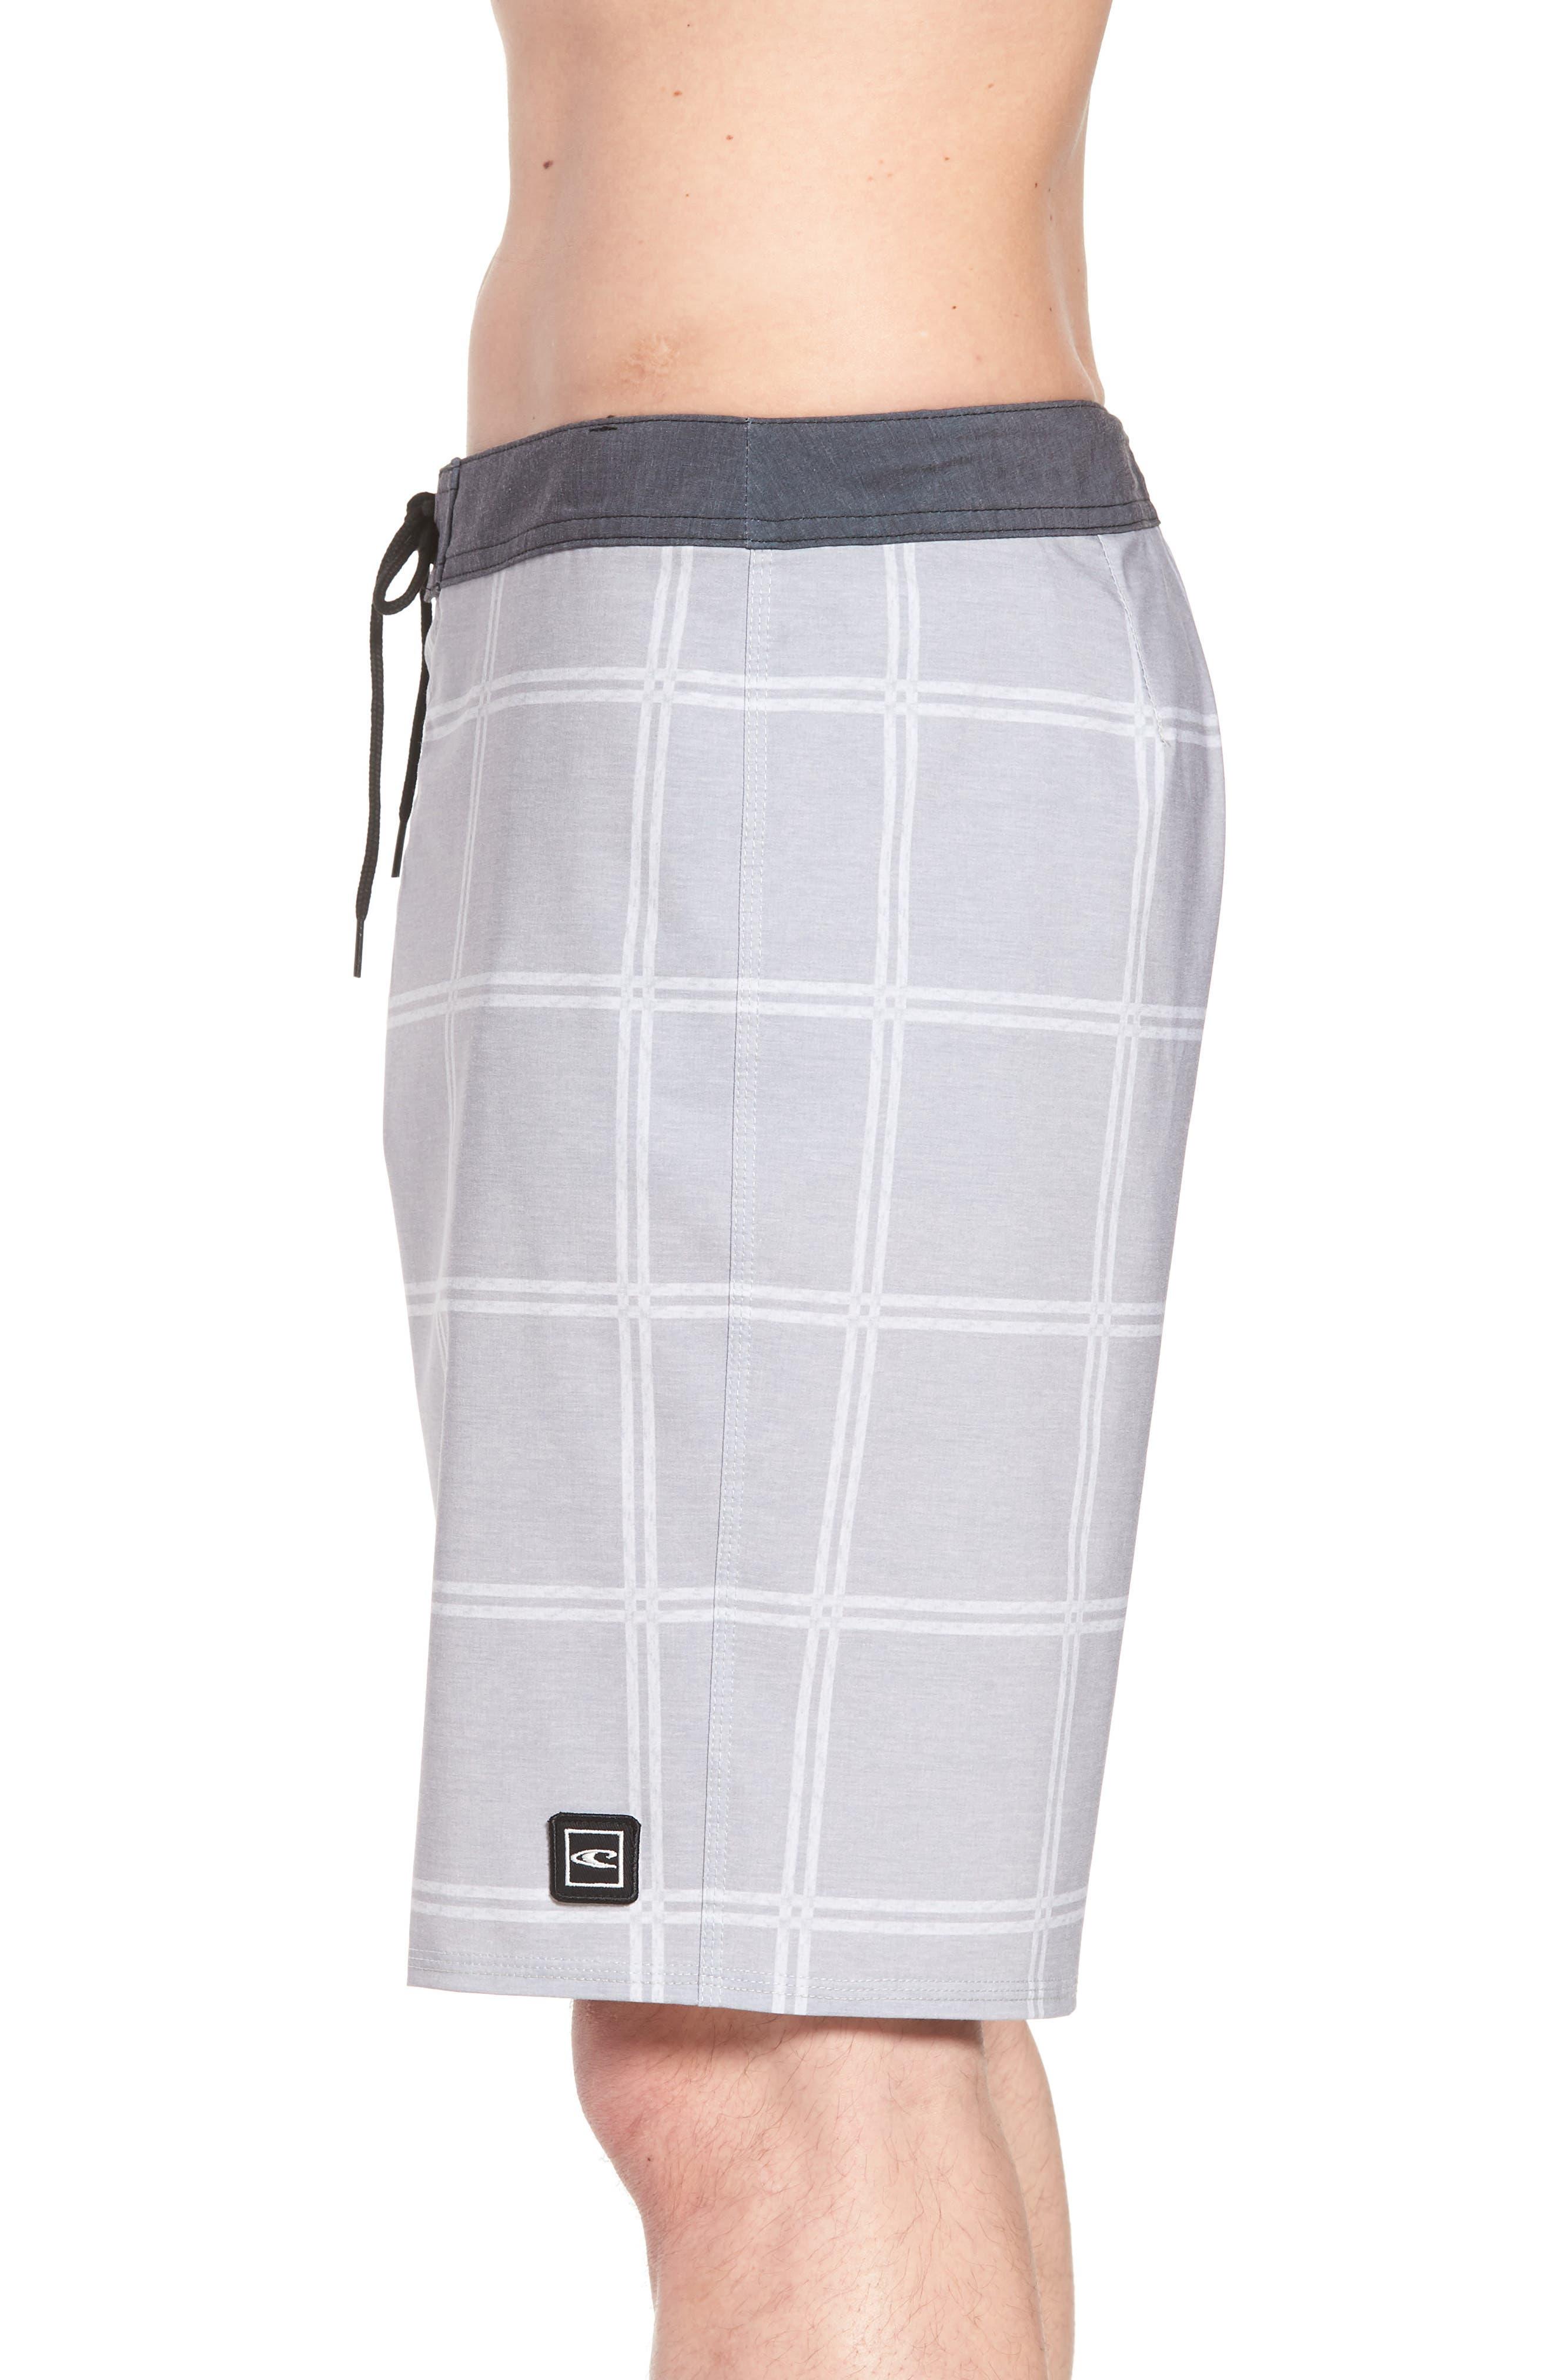 Head High Board Shorts,                             Alternate thumbnail 4, color,                             020